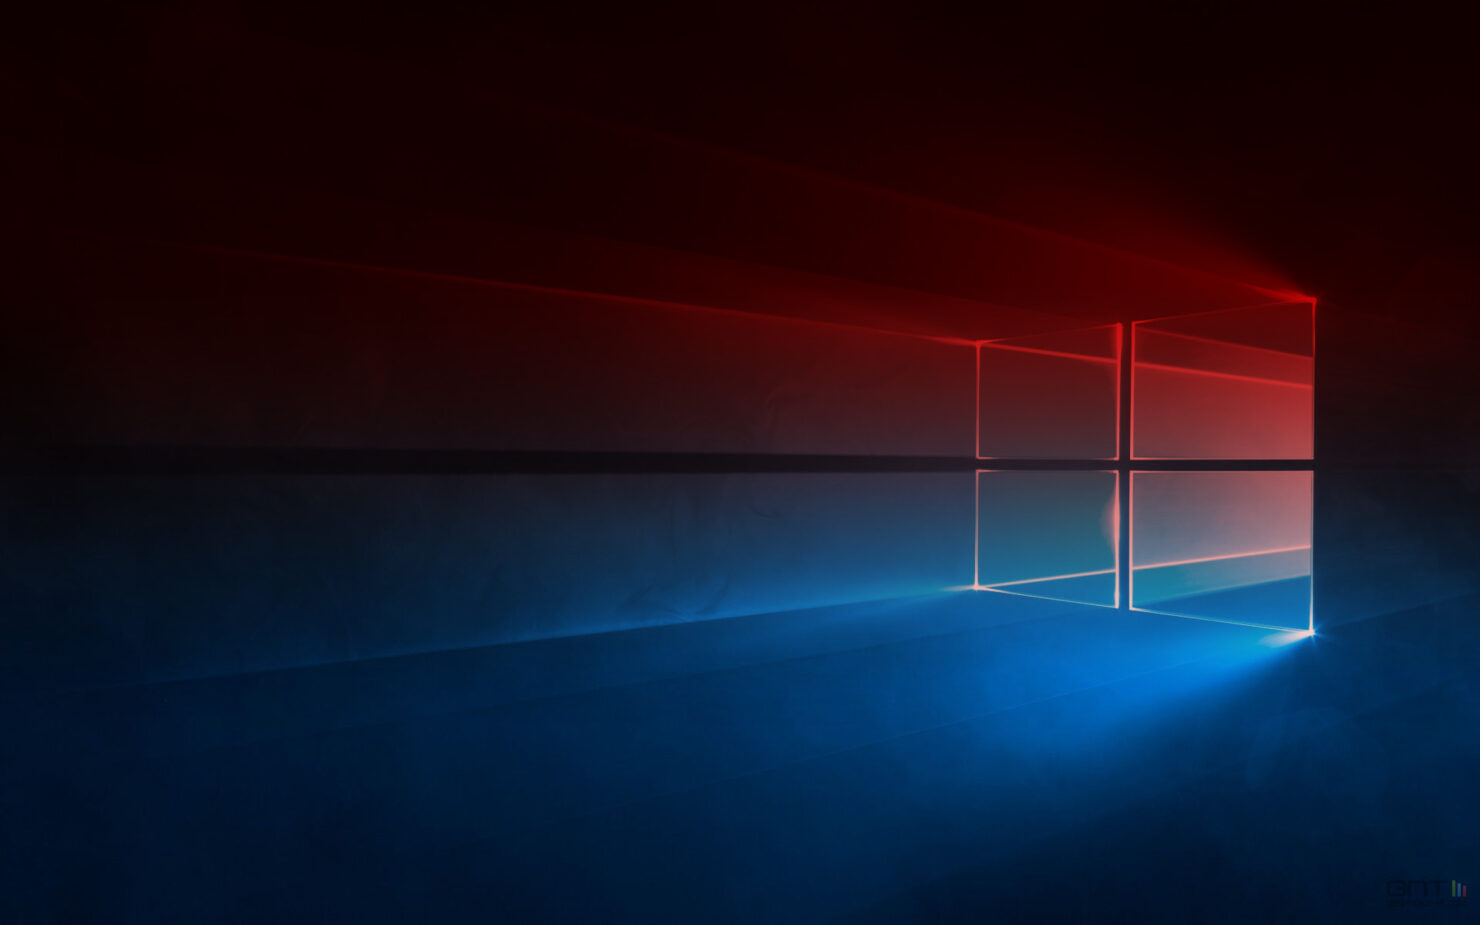 windows 10 spring creators update redstone 4 Windows 10 Redstone 5